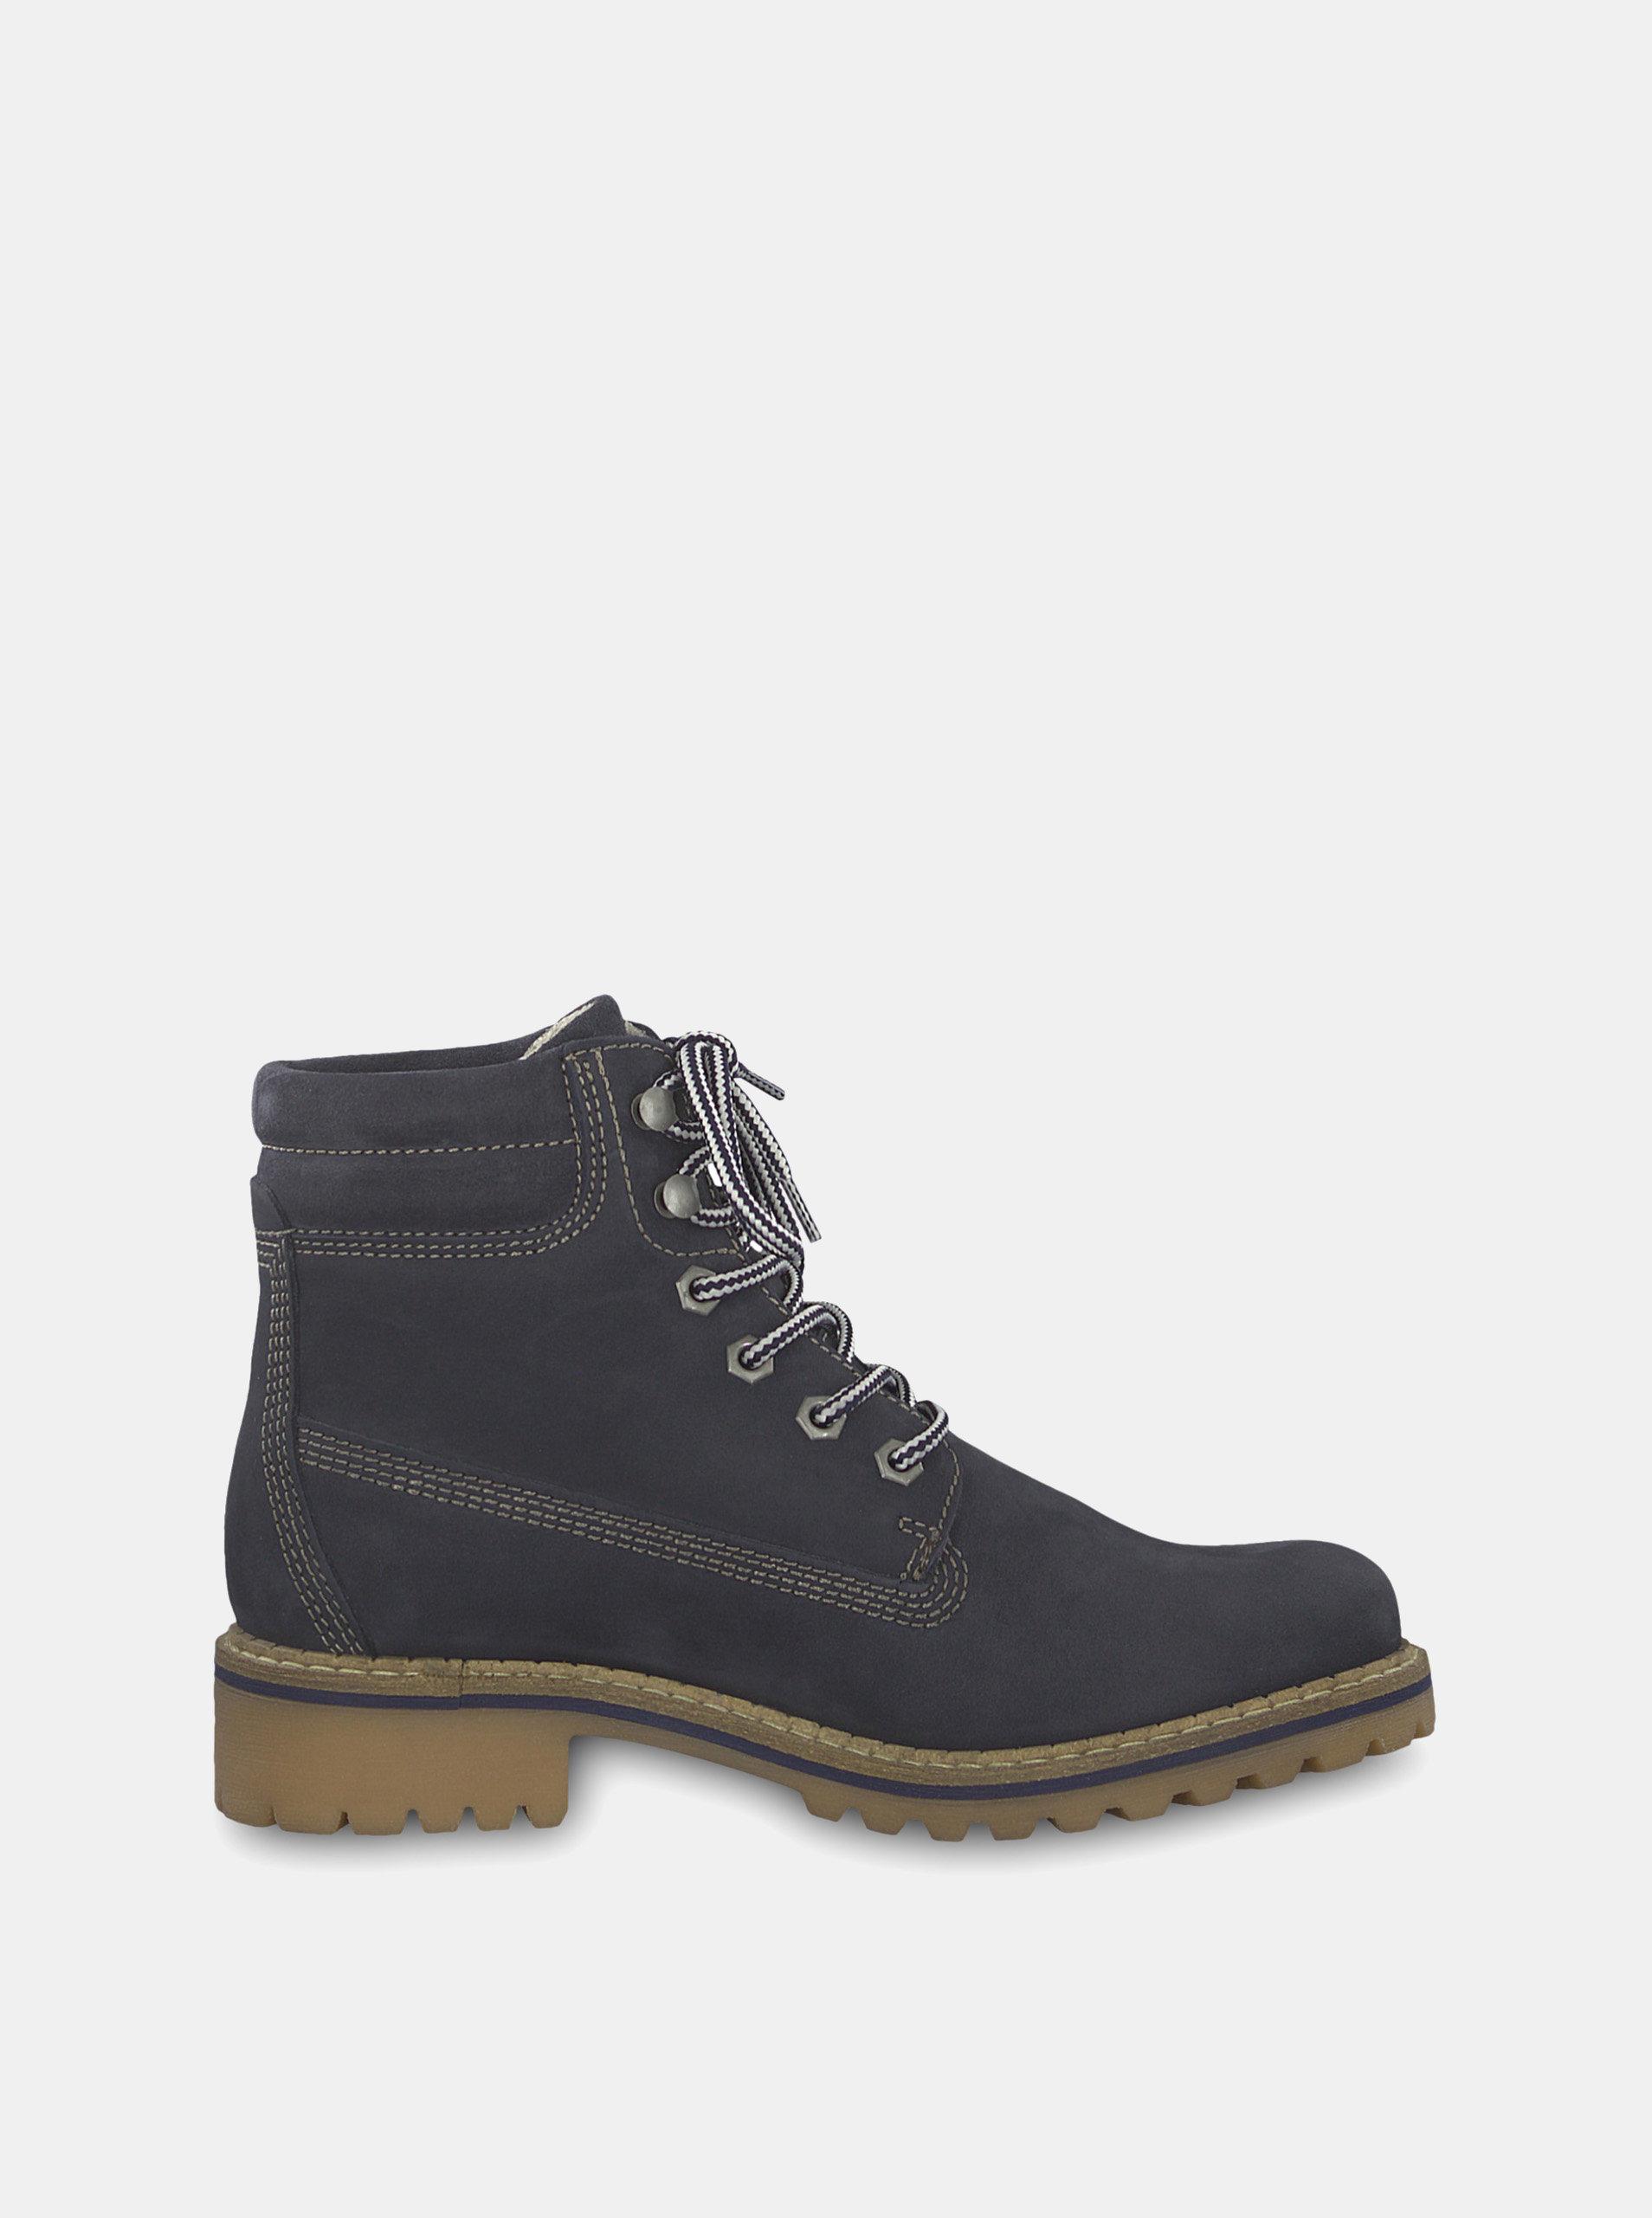 bcb1a936d1291 Tmavosivé semišové členkové topánky Tamaris | ZOOT.sk